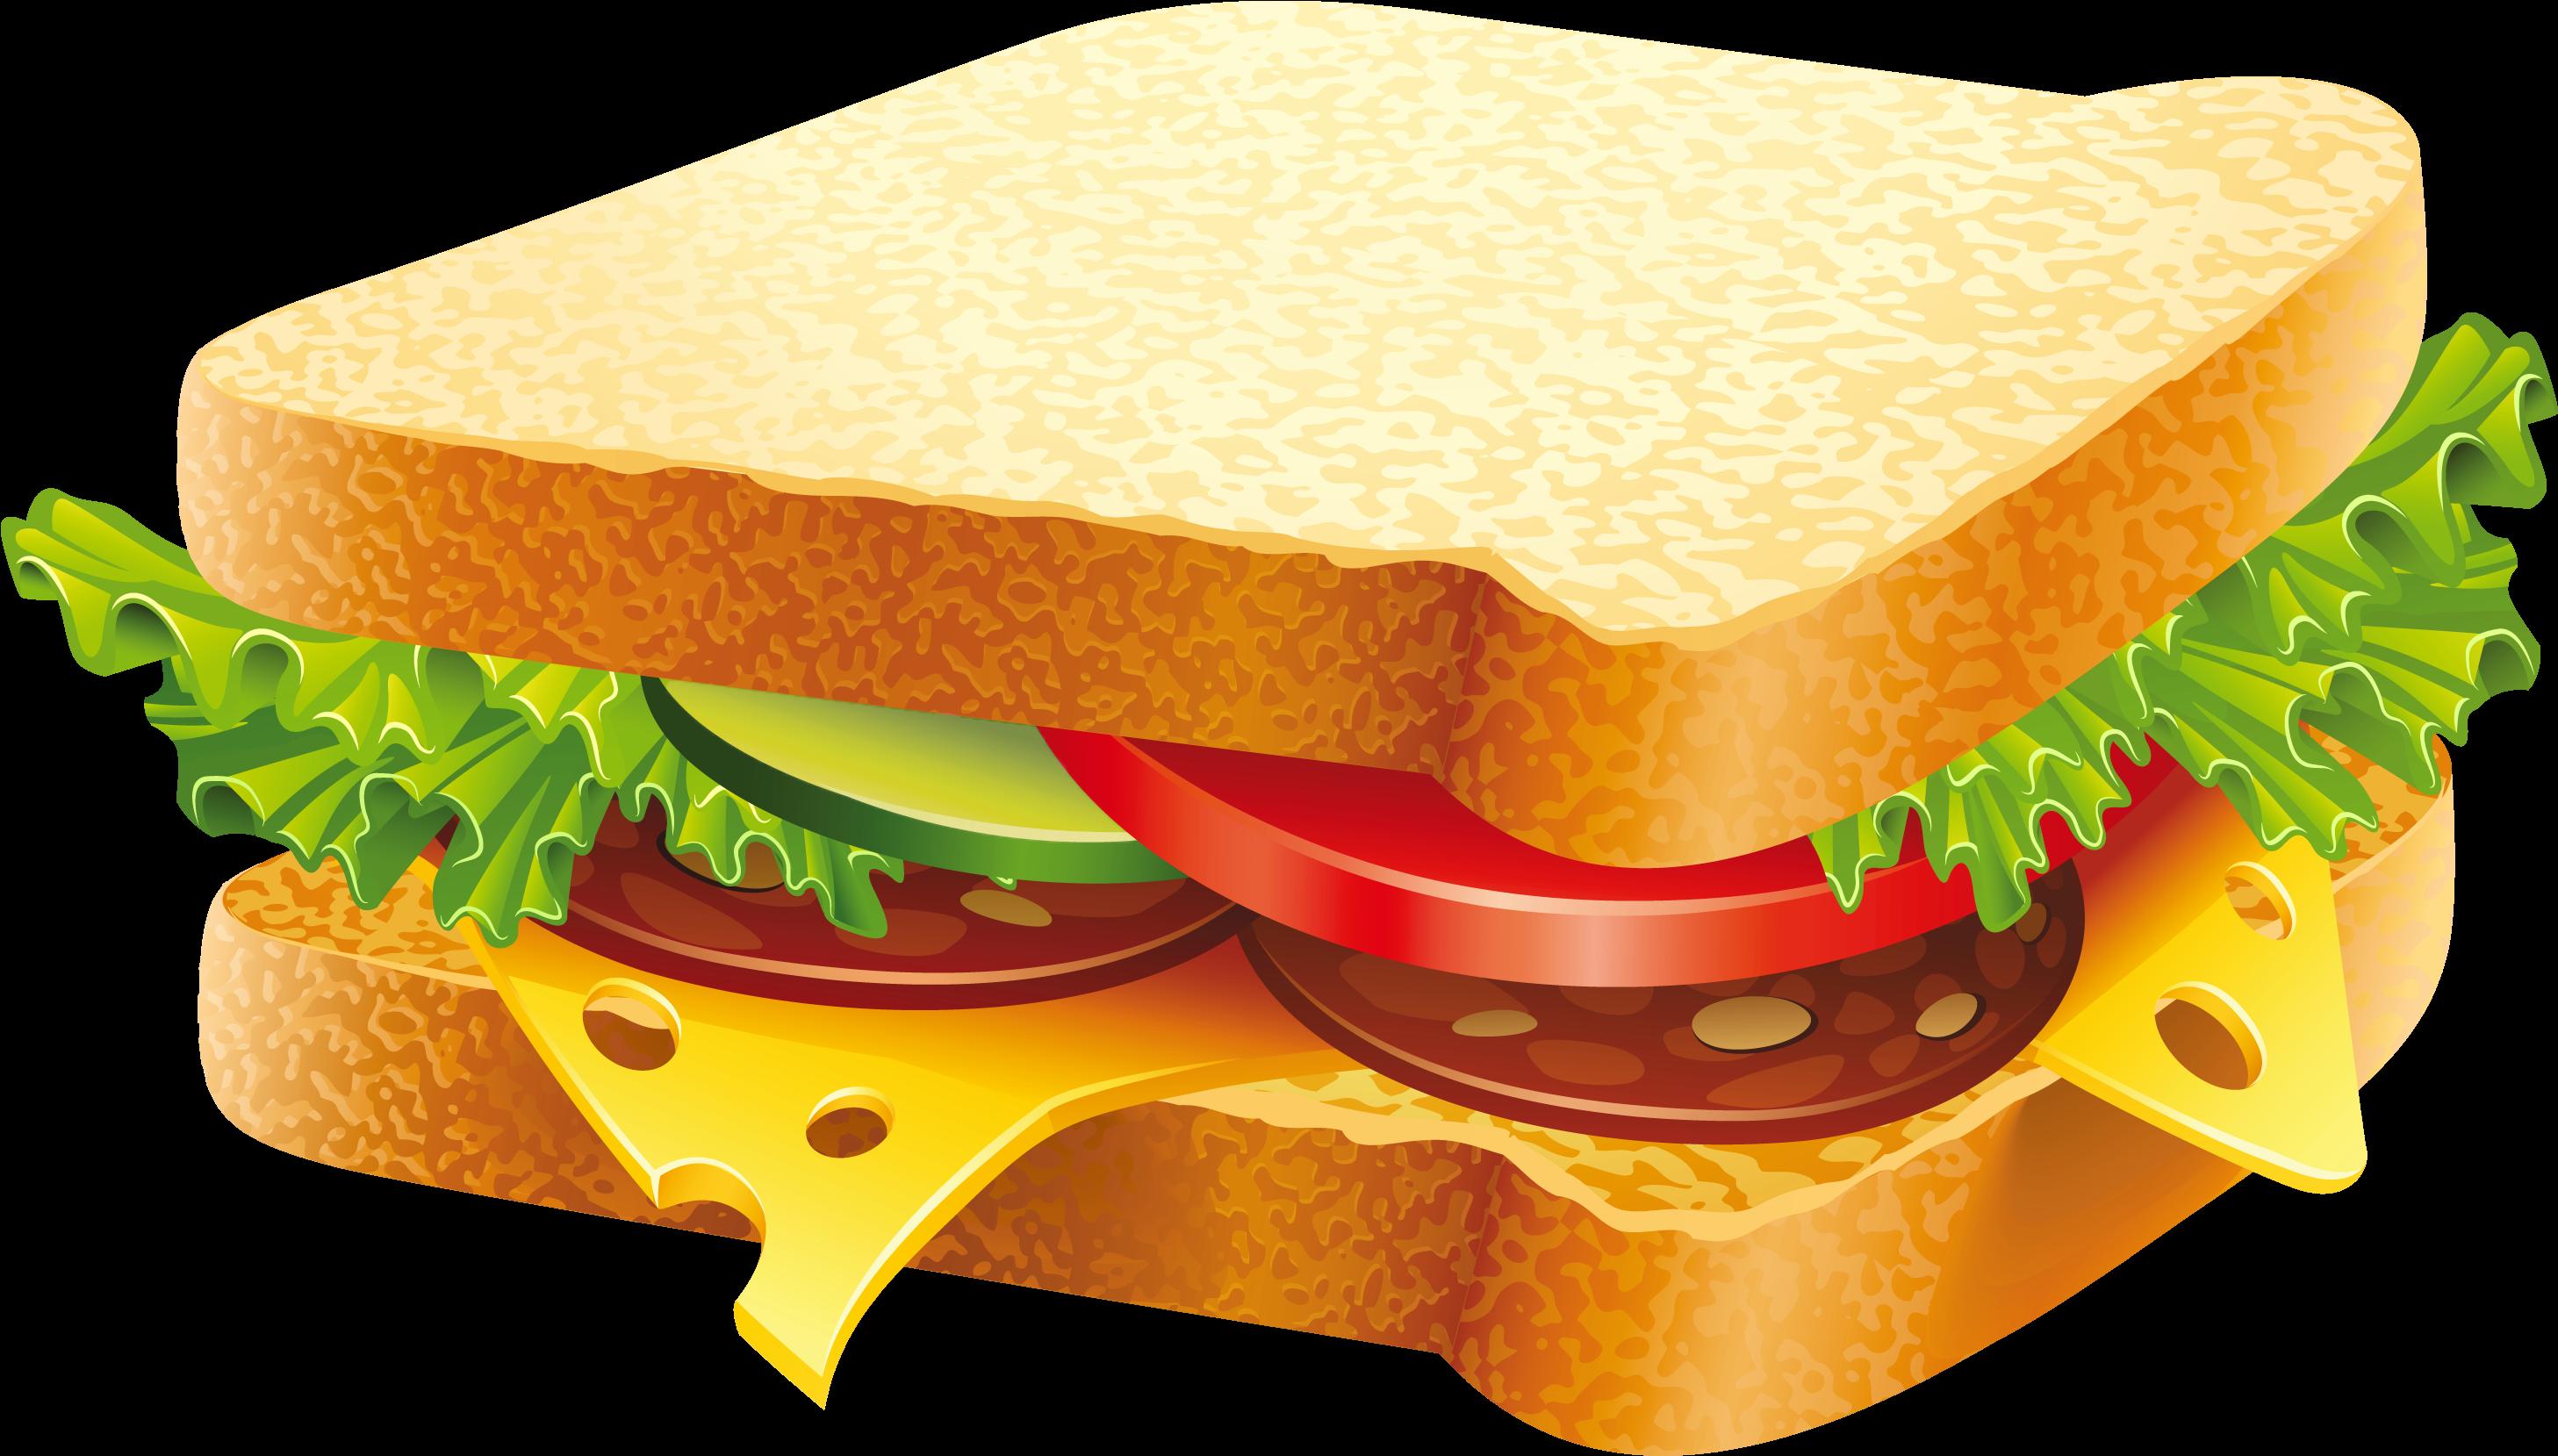 Transparent food clipart - Sandwich Png Clipart Image - Fast Food Images Download